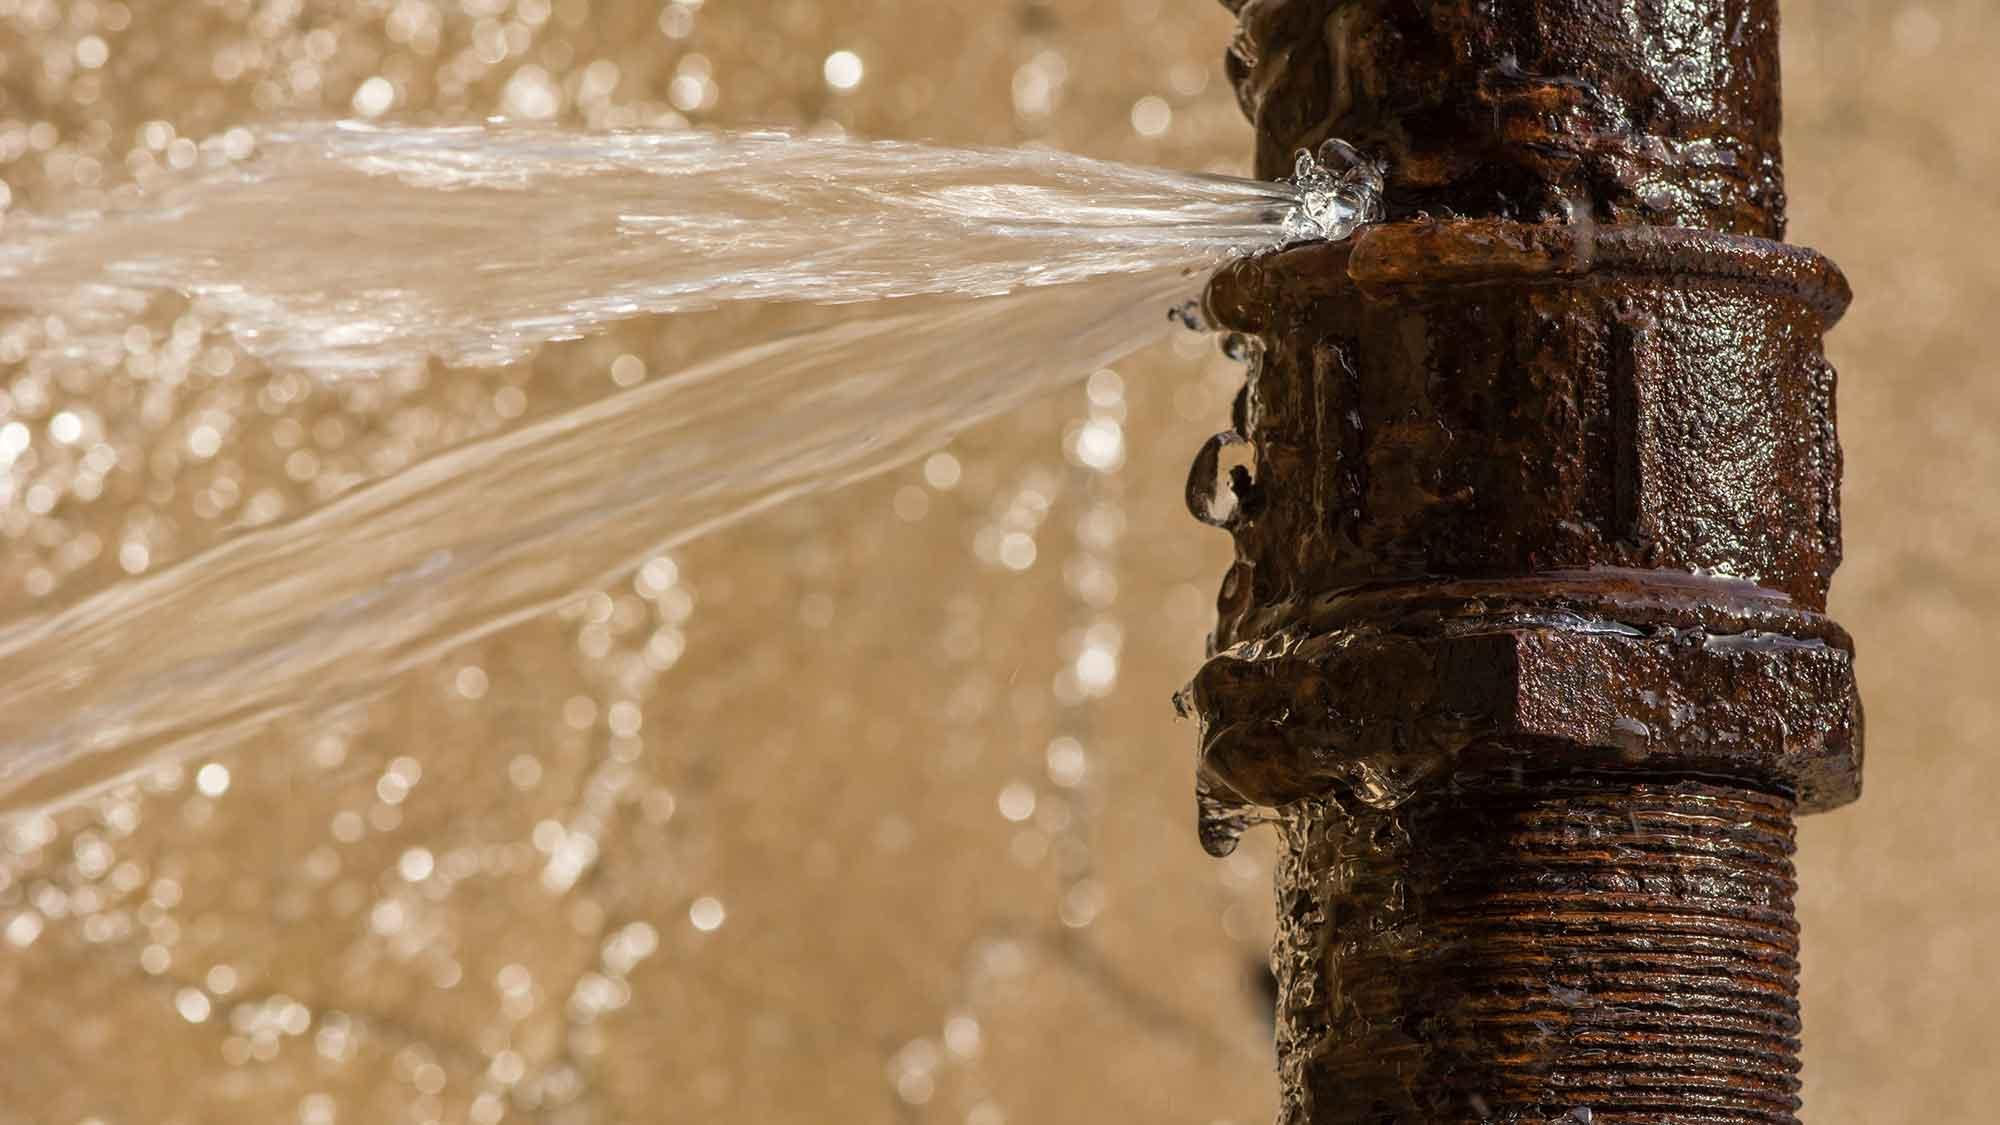 burst pipe repair essex maintenance leigh on sea leak